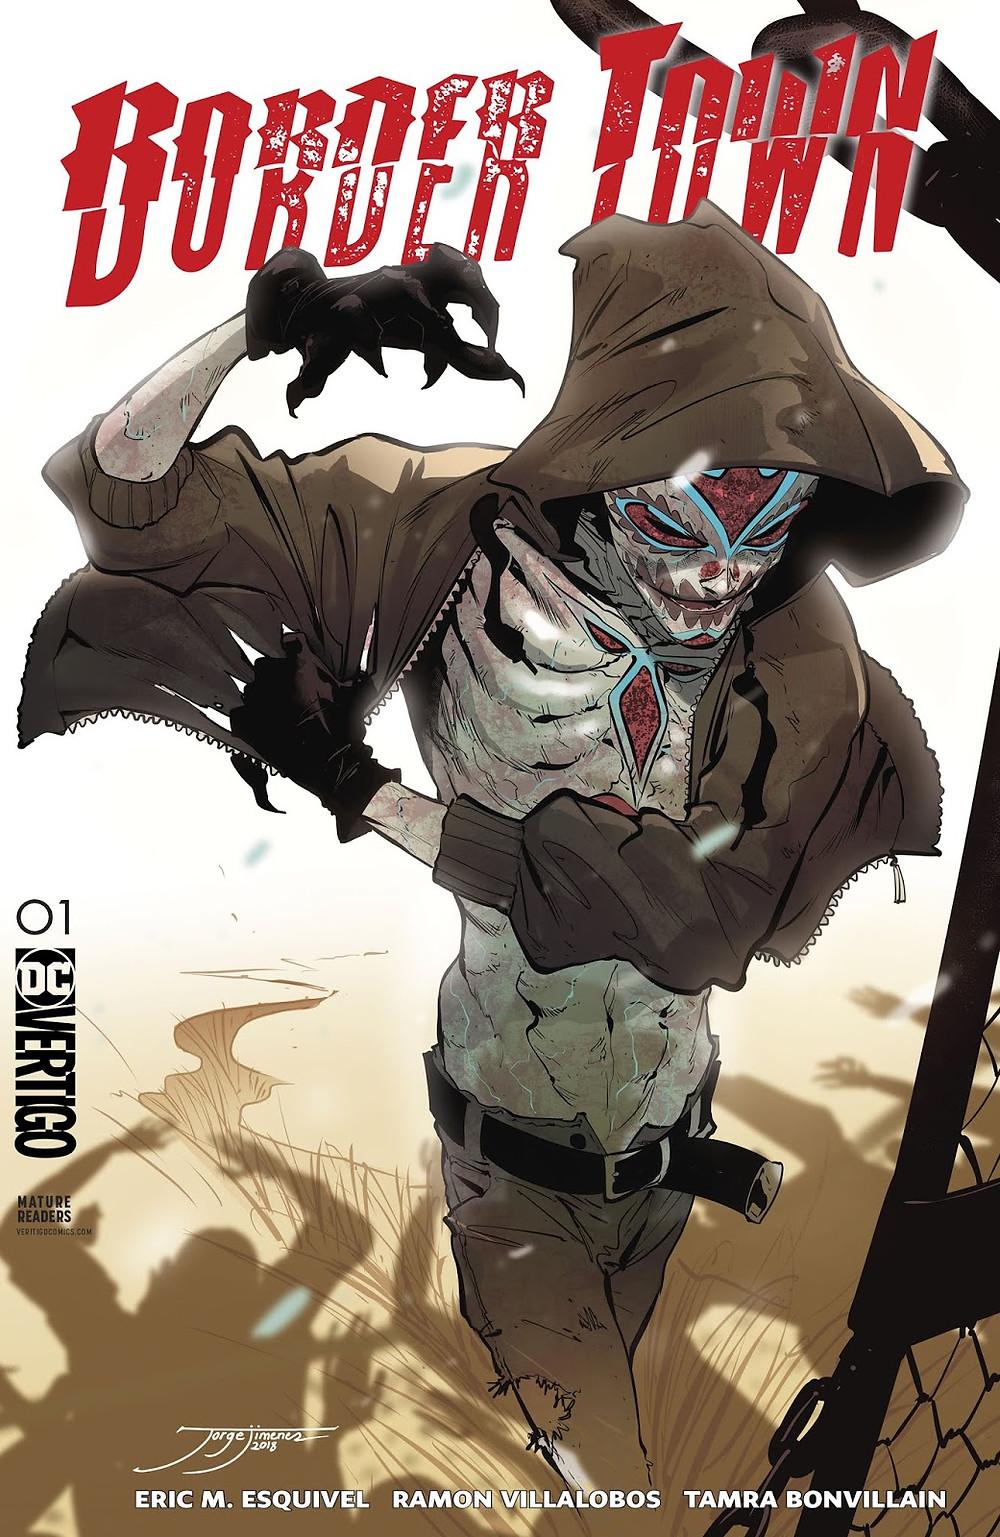 Bordertown #1 Variant Cover by Jorge Jimenez